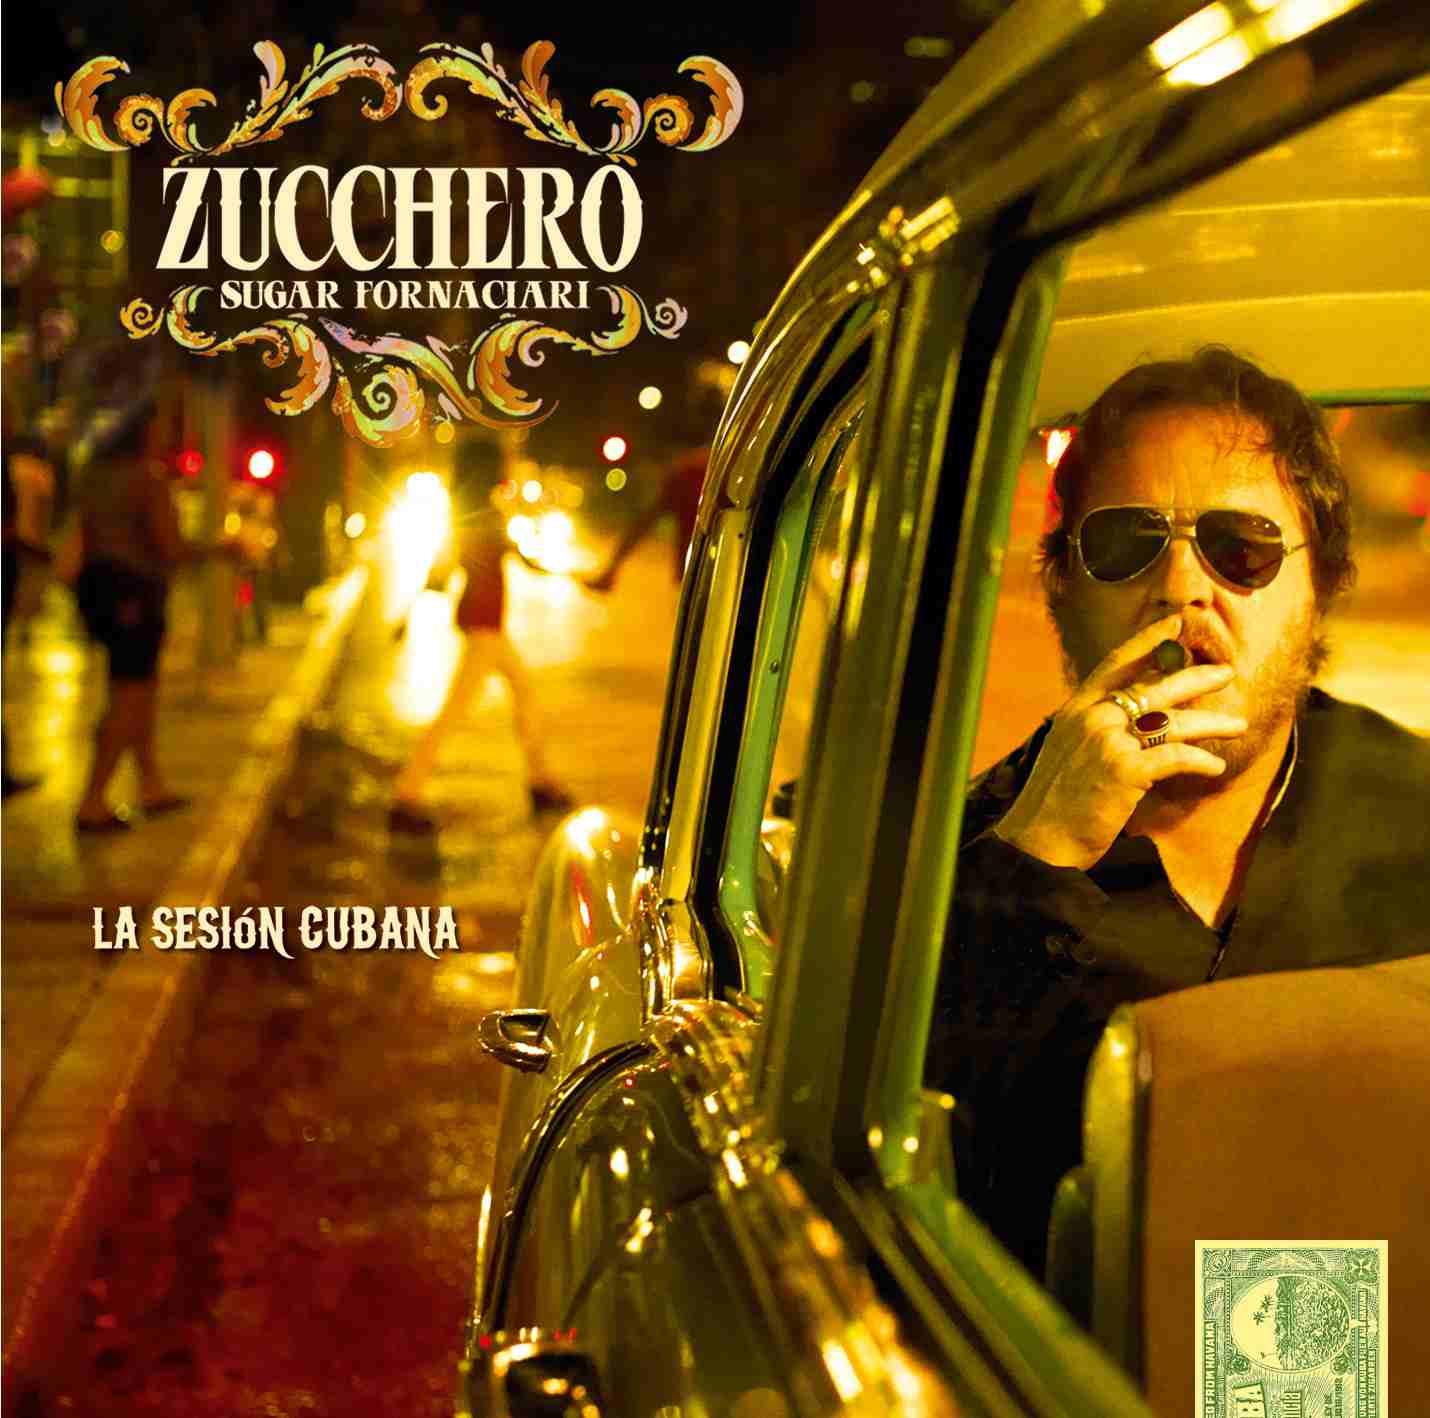 Zucchero - La Sesion Cubana